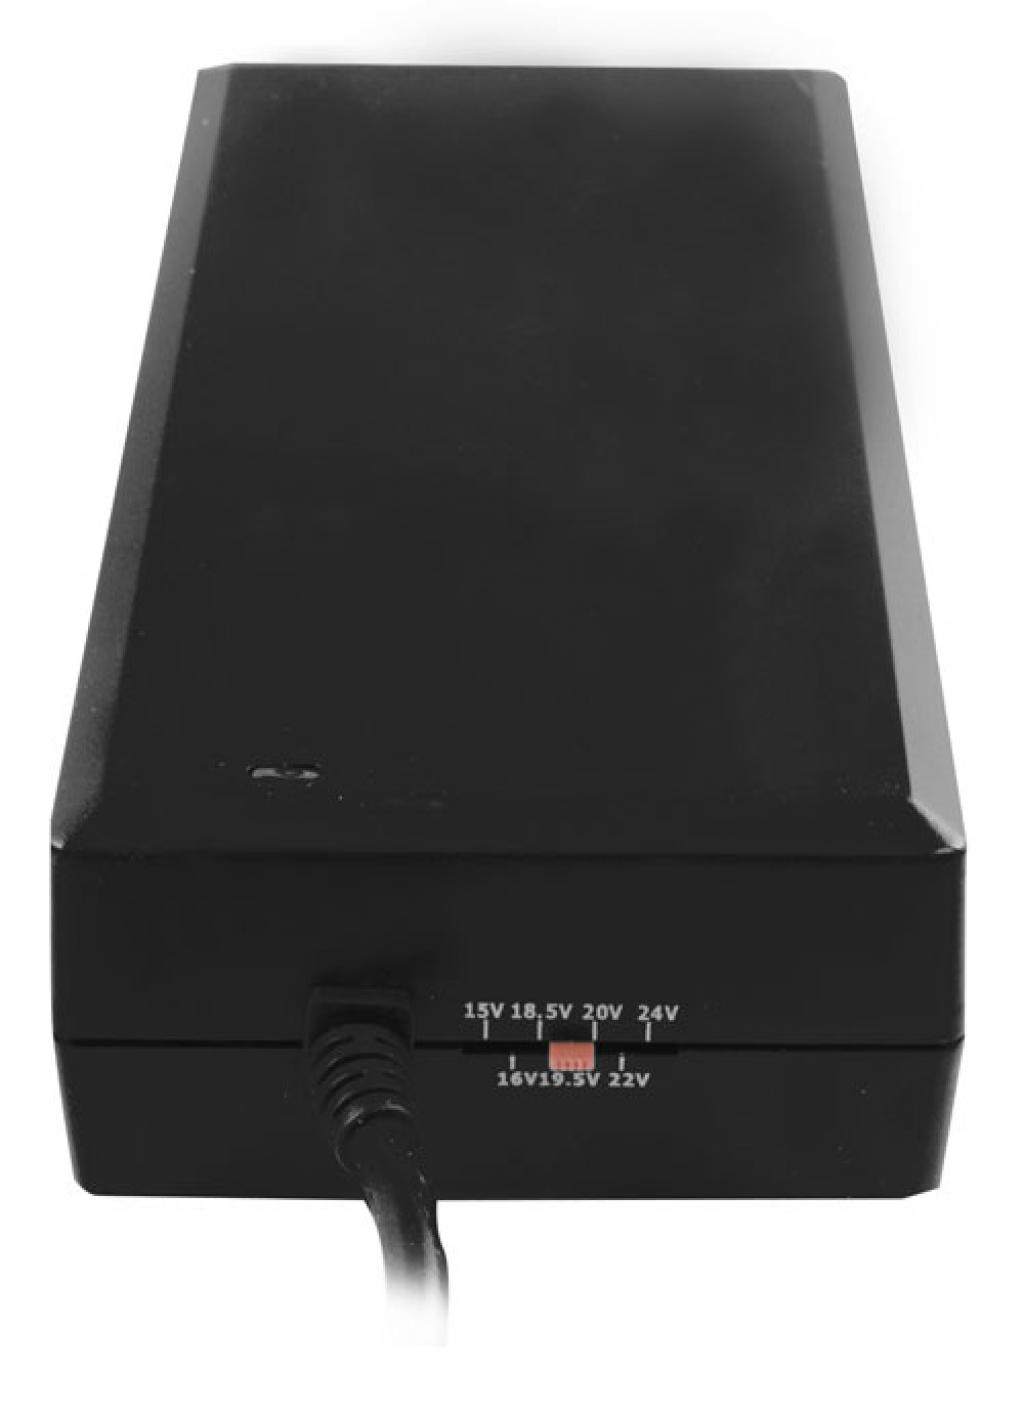 Incarcator 12v/24v Sumvision 150w Cu 9 Conectori